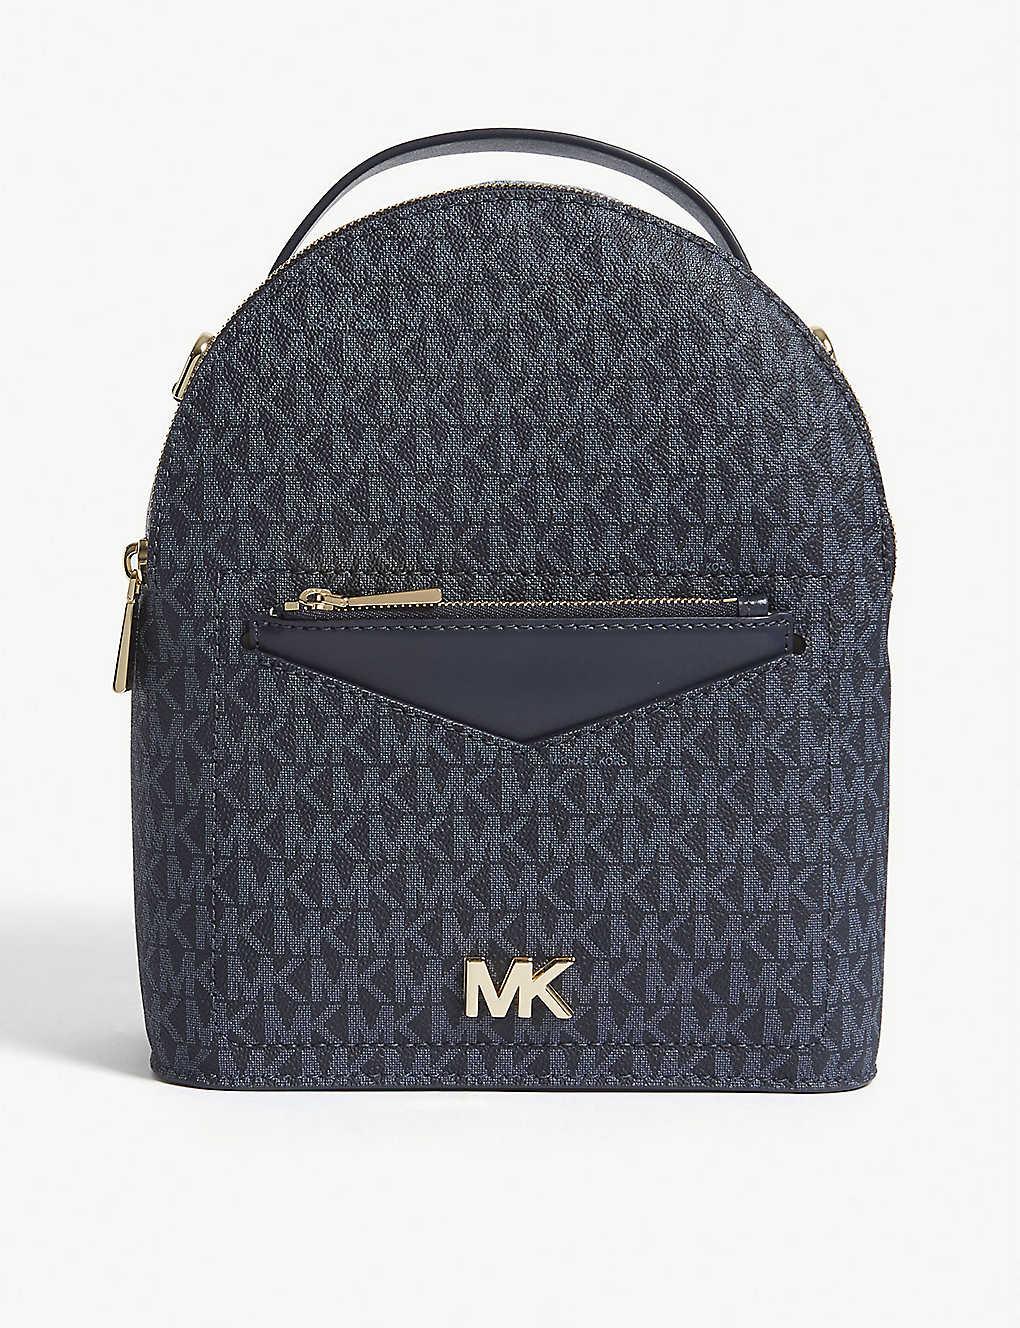 2dc5461ba50e MICHAEL MICHAEL KORS - Jessa small leather cross-body backpack ...